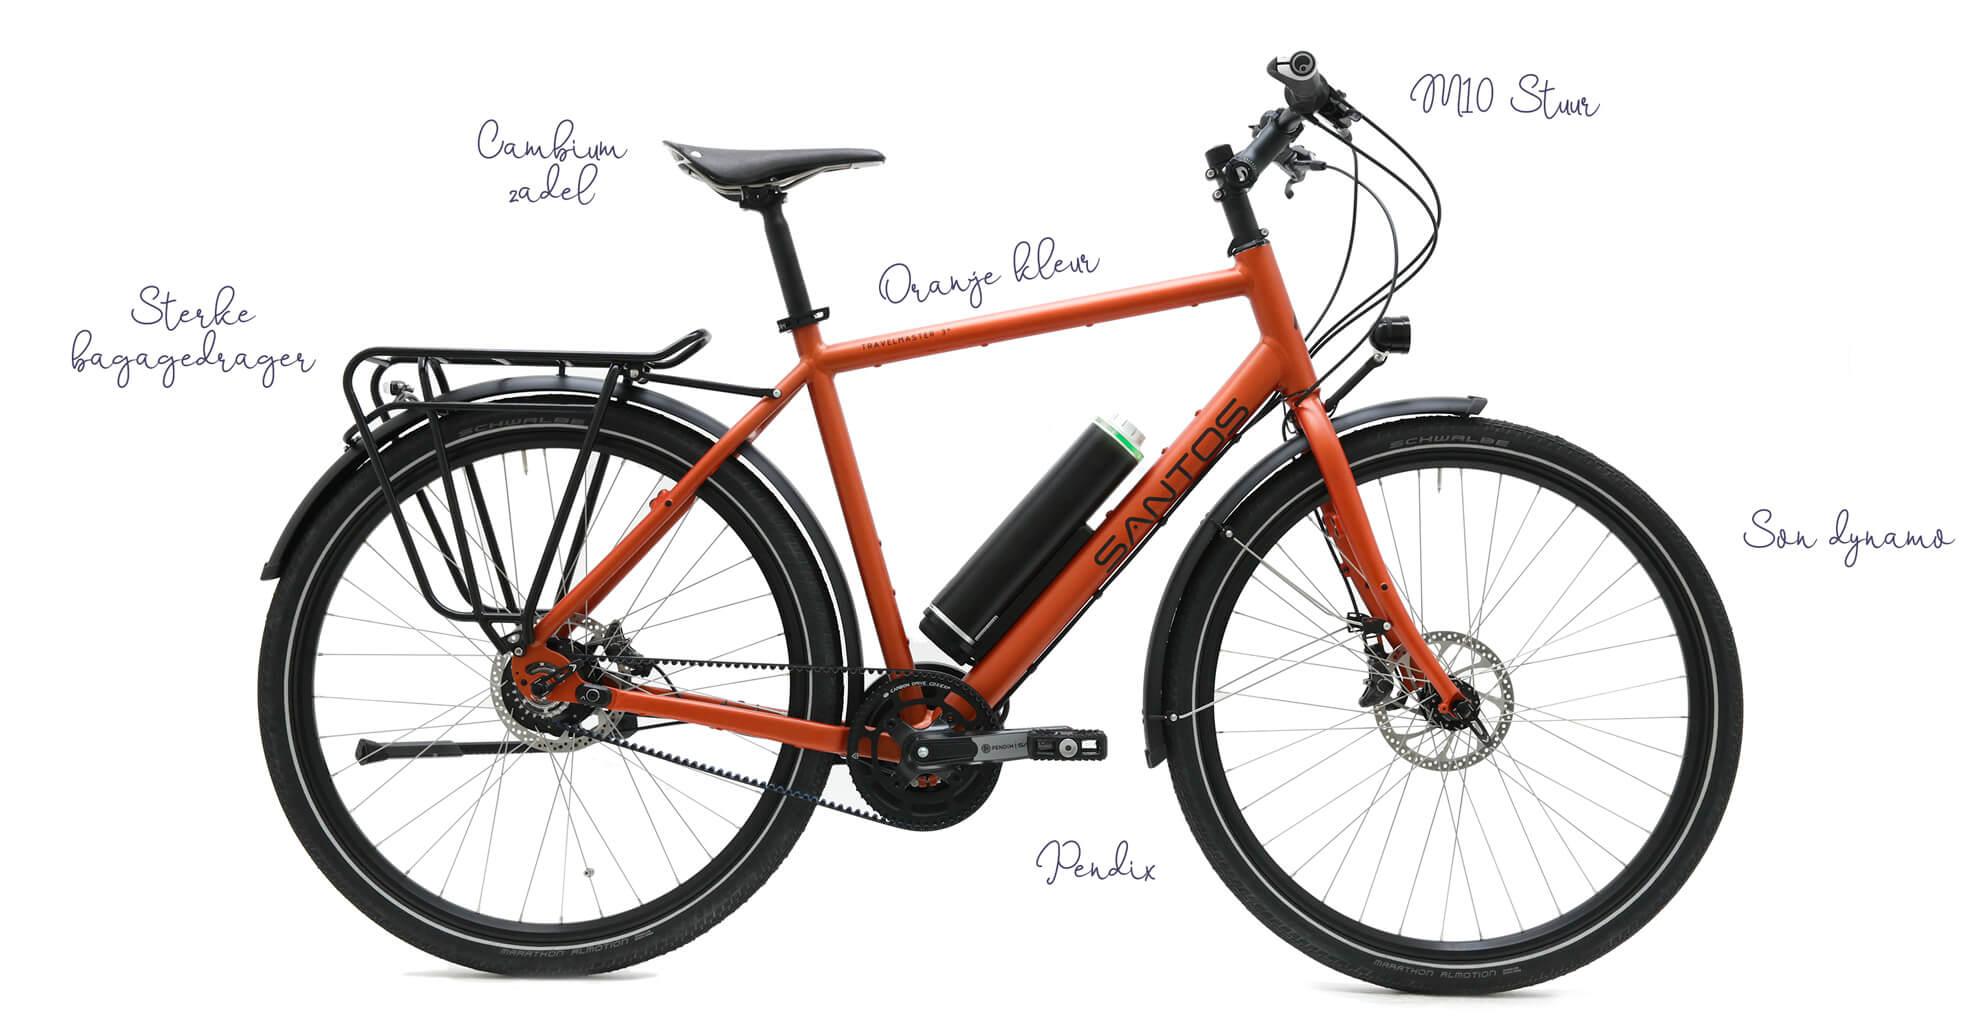 Santos Custom build fiets fietsen Jurgen